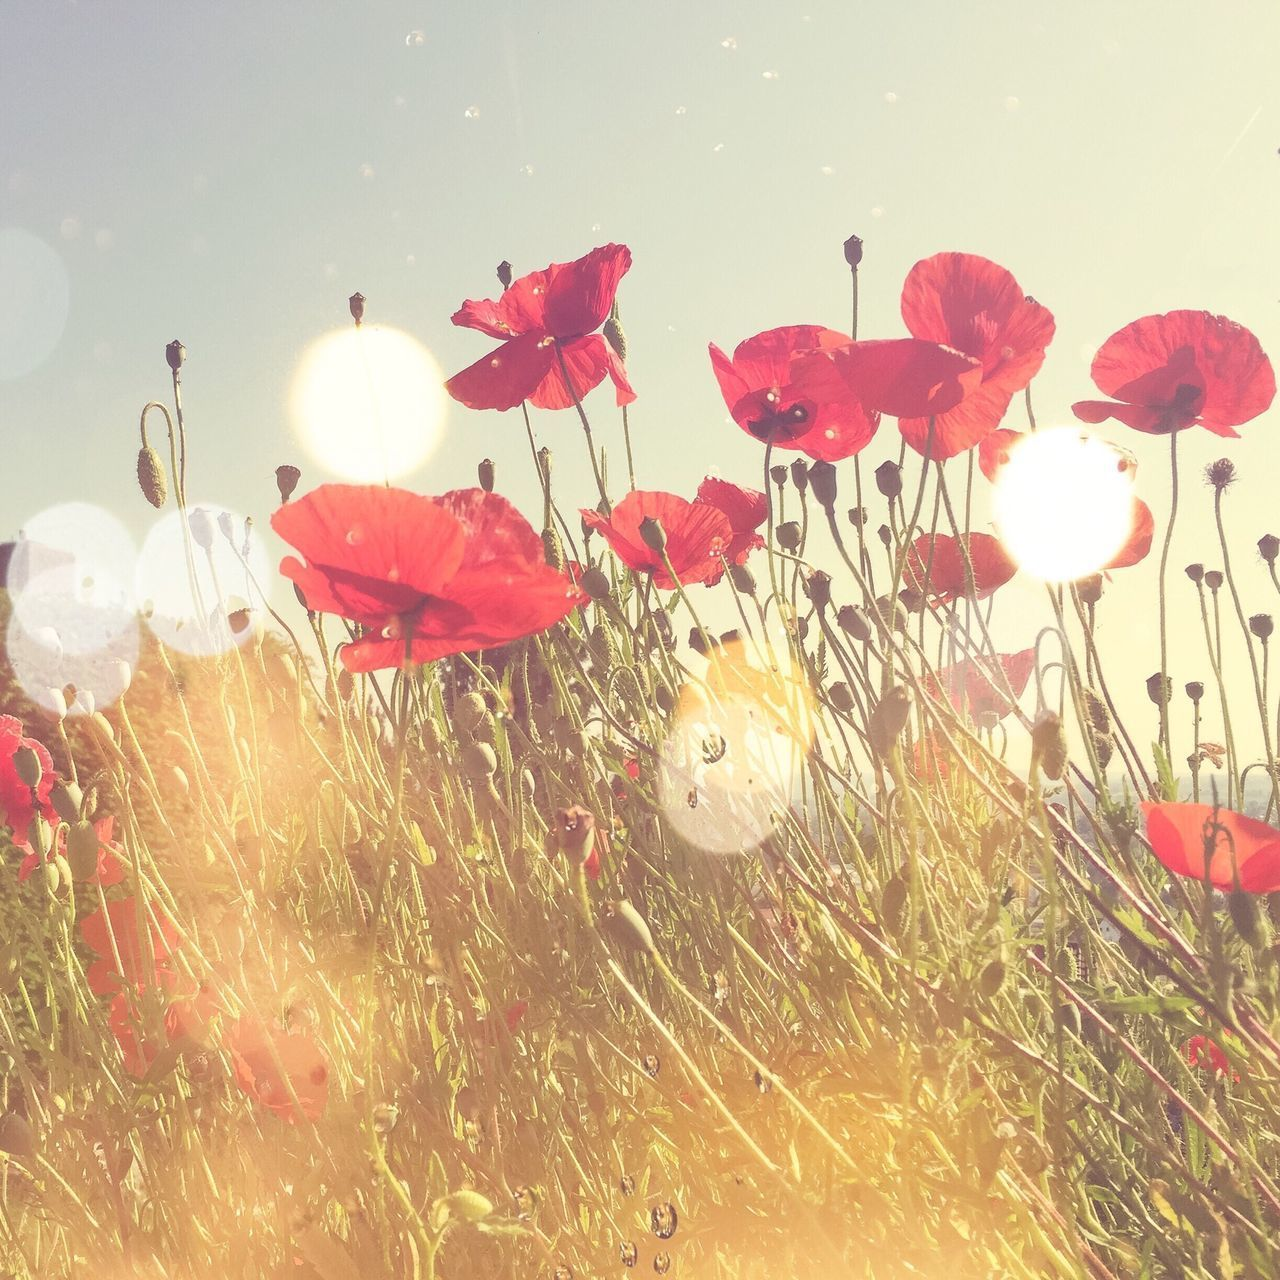 Poppy field in the light Poppy Field Flowers Meadow Light Sun Nature Bokeh Art Summer Spring Red Vintage Retro Bright Morning Sunlight Sunny Sunrise Beauty Beautiful Card Postcard Romantic Health